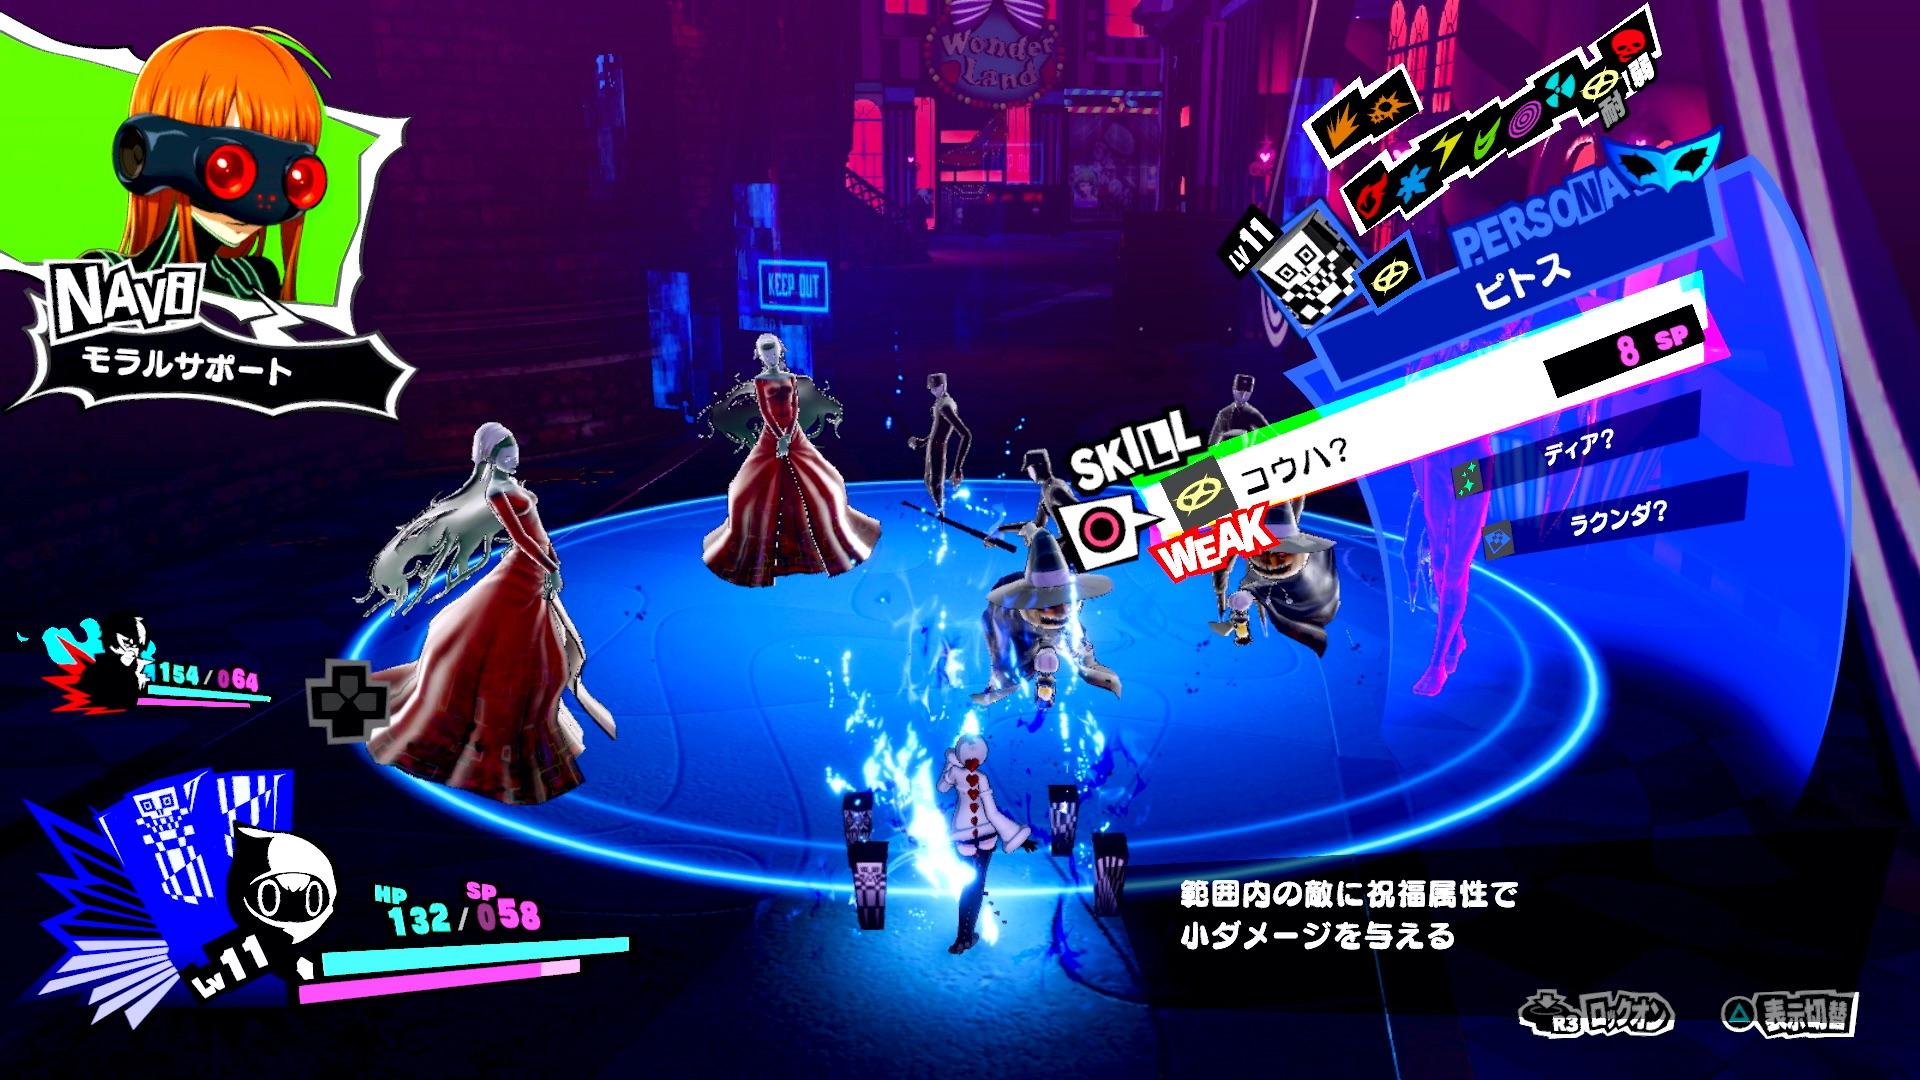 Persona 5 Strikers Screenshot of characters in combat.